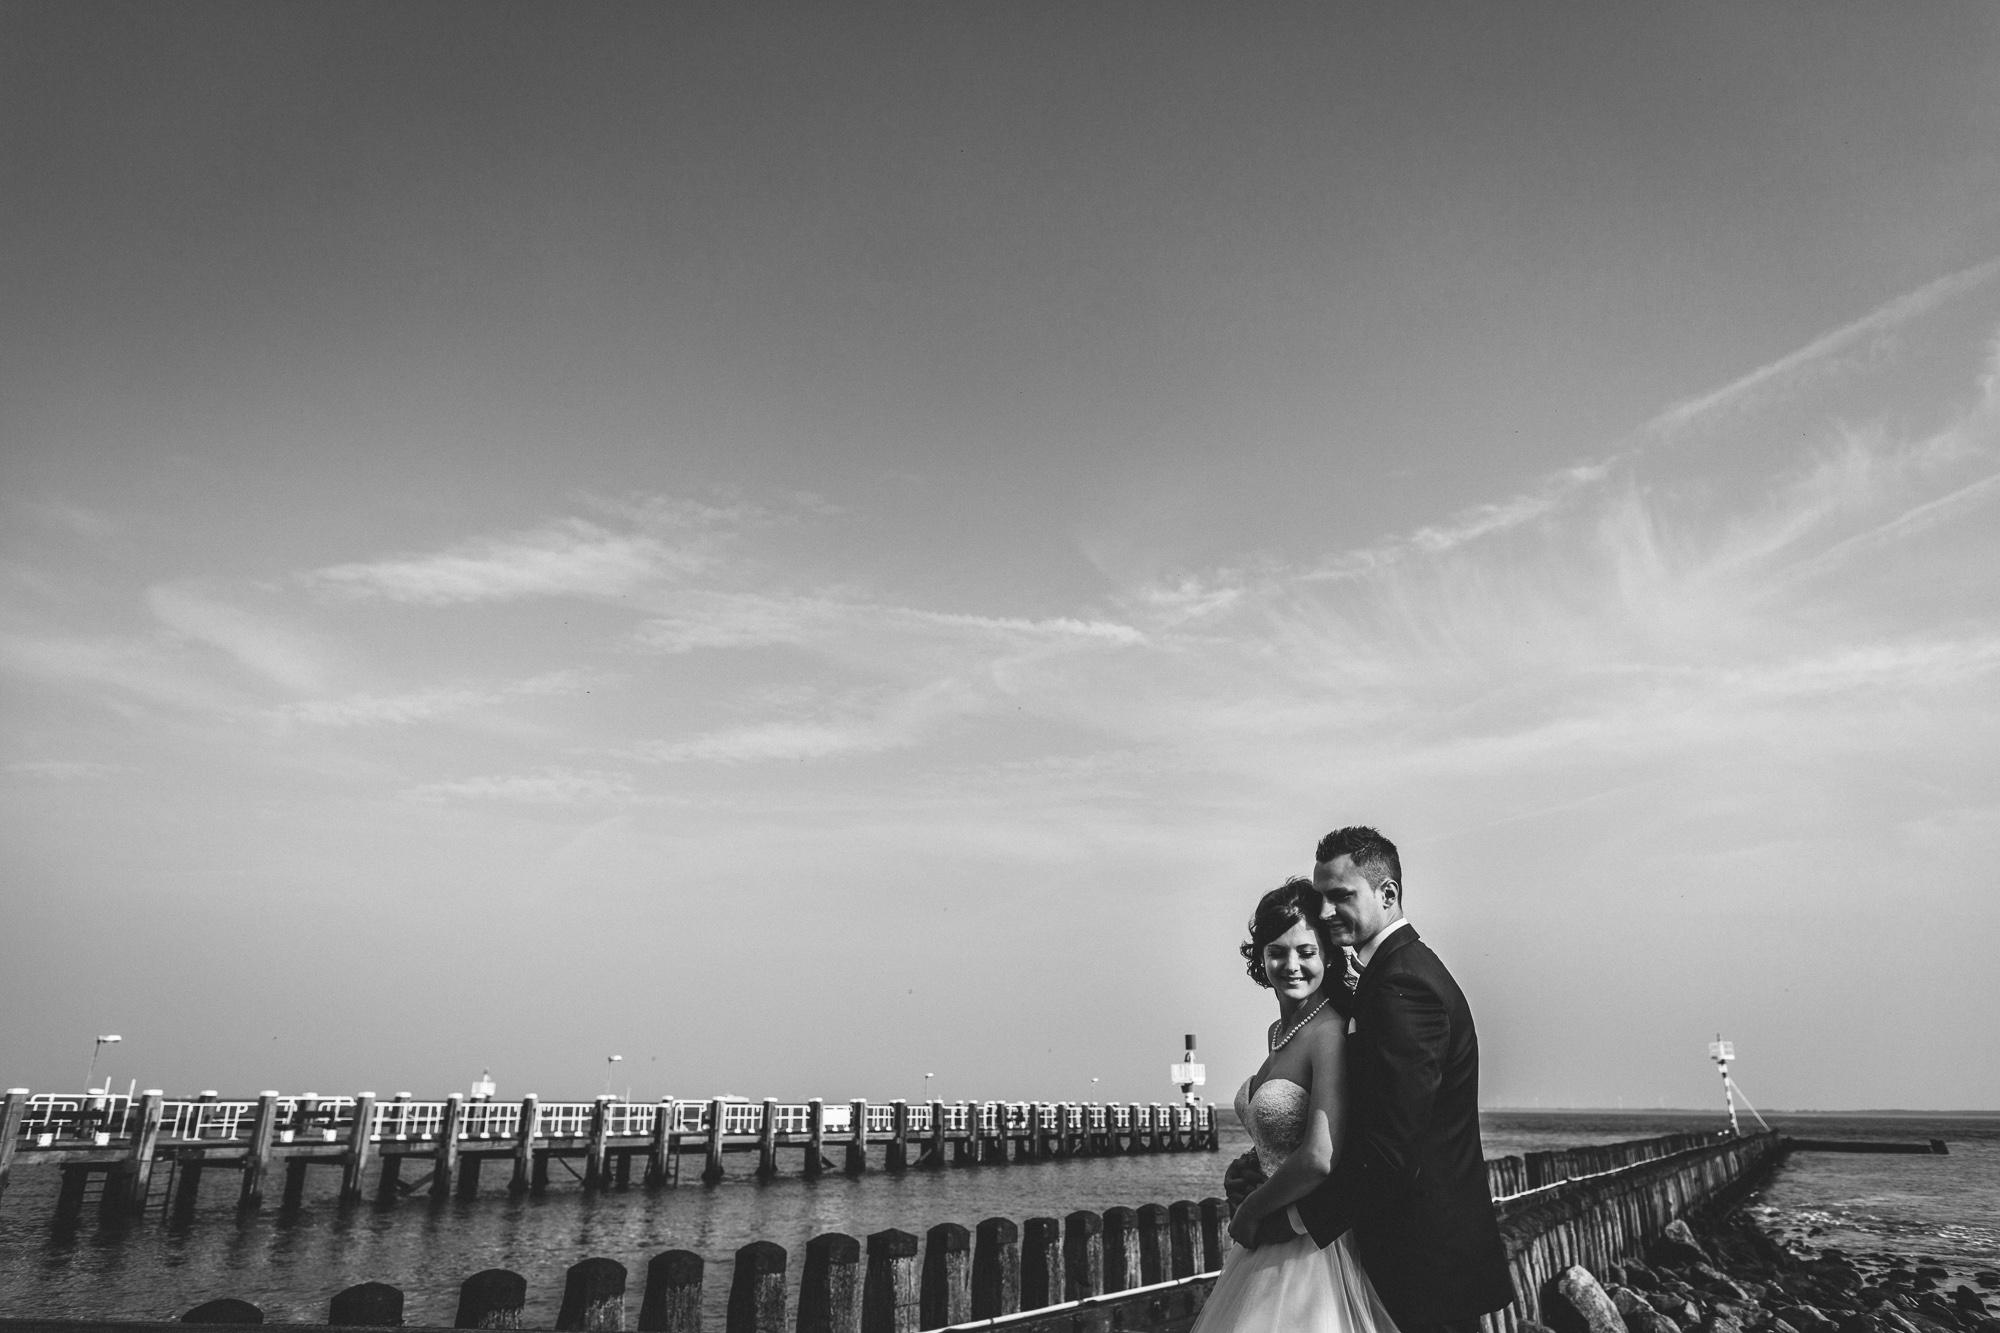 after wedding ia 036 - Afterwedding in Zeeland / Holland